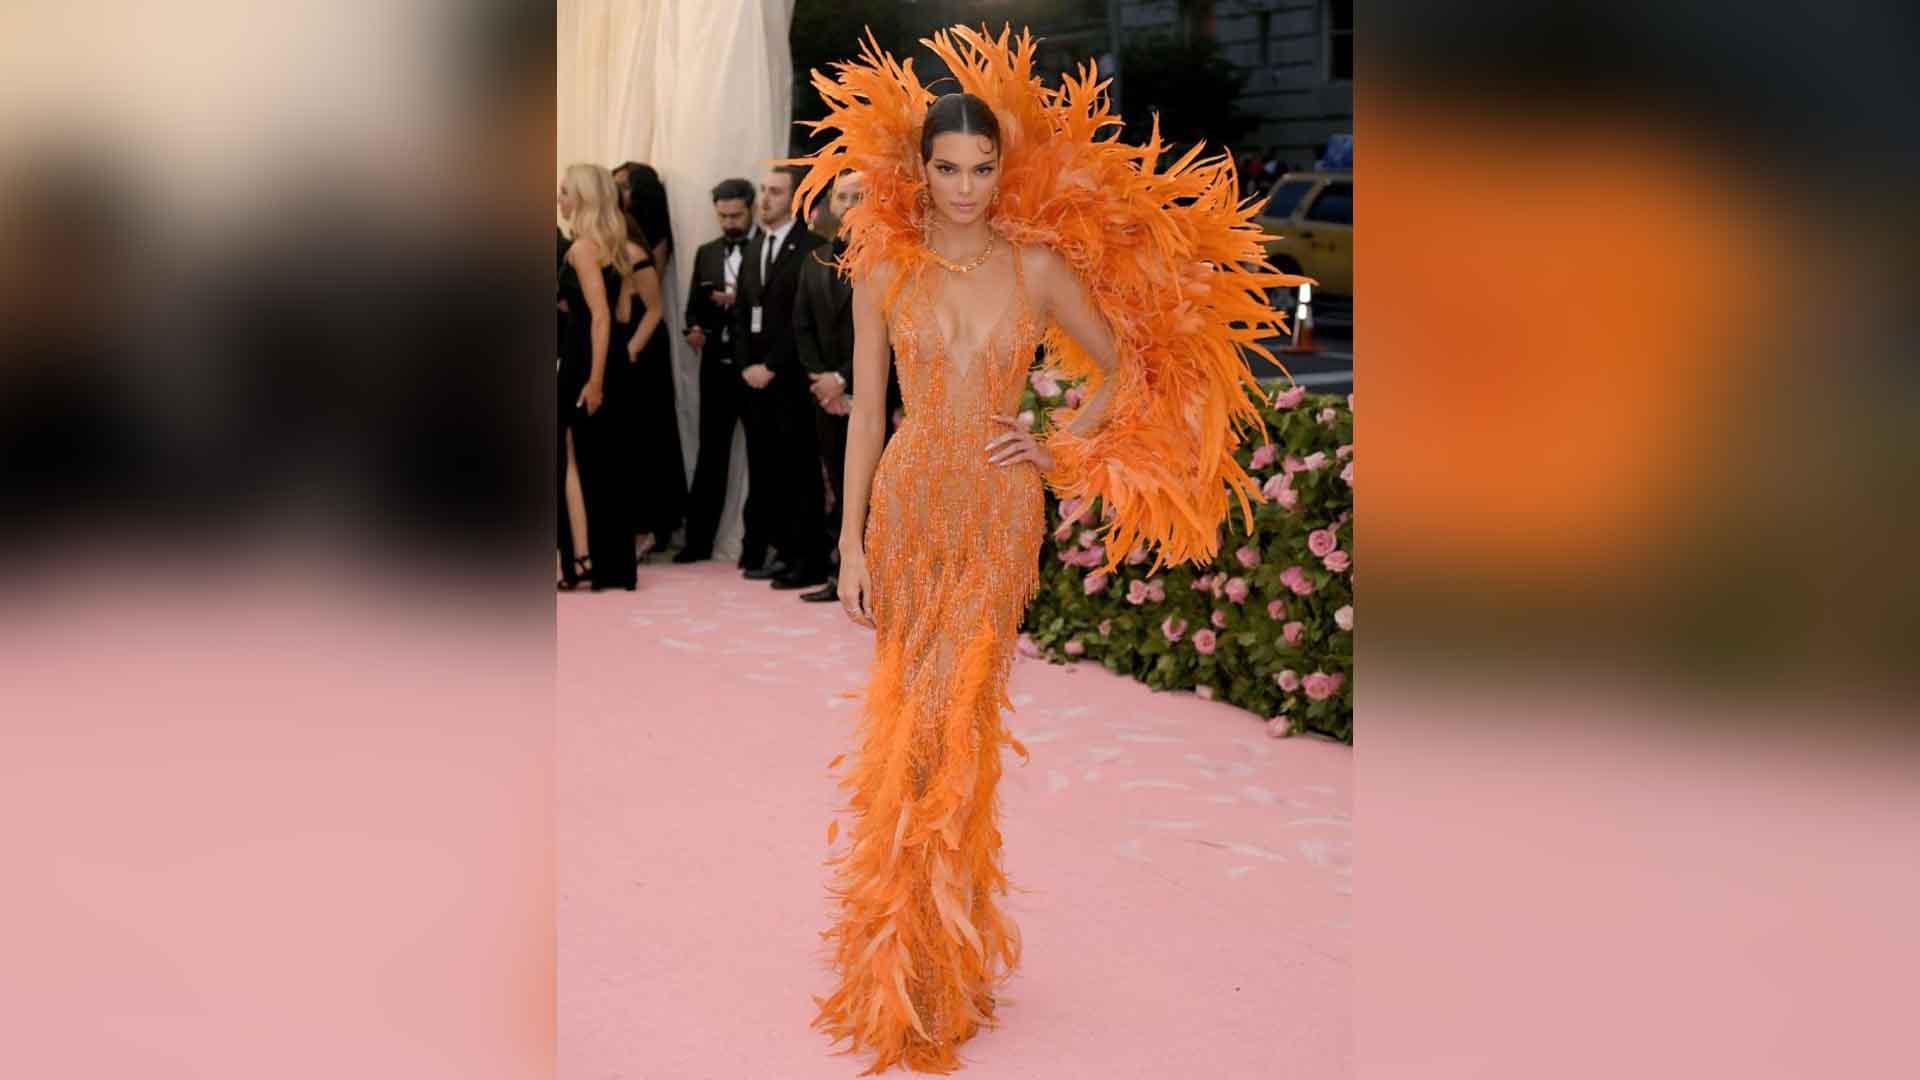 La modelo Kylie Jenner, de 21 años.